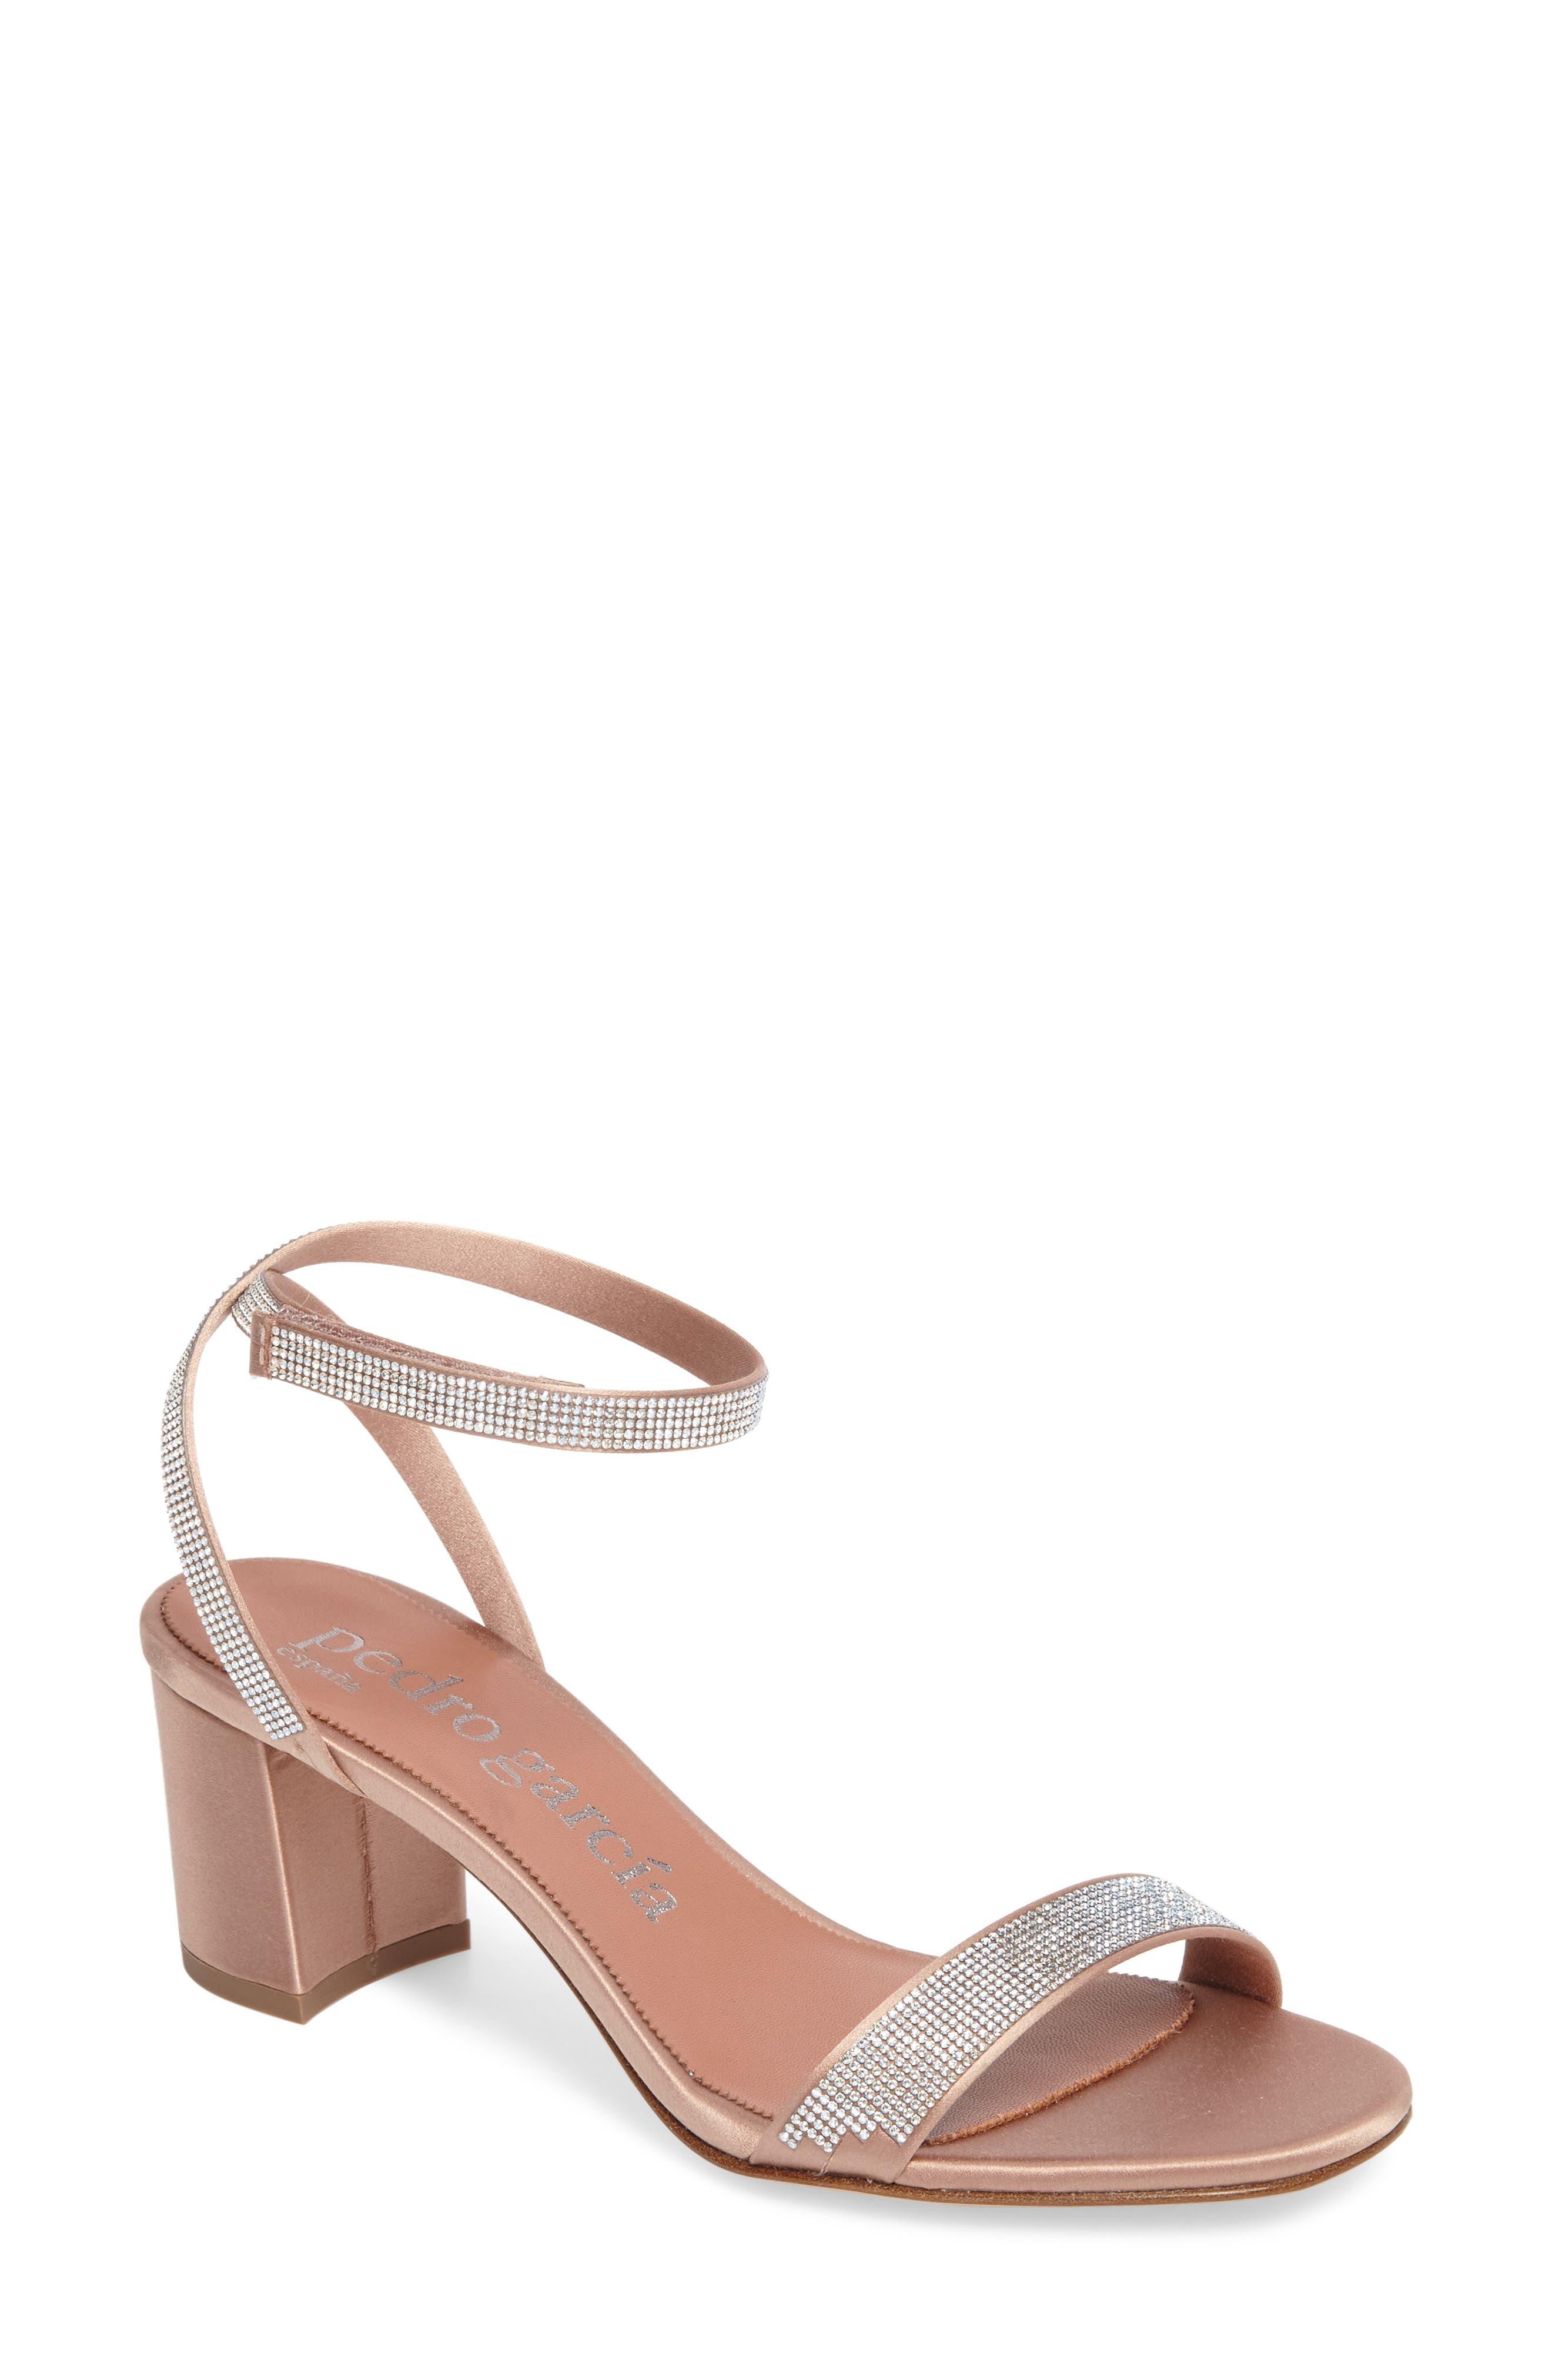 Xela Block Heel Sandal,                         Main,                         color, BISQUE SATIN